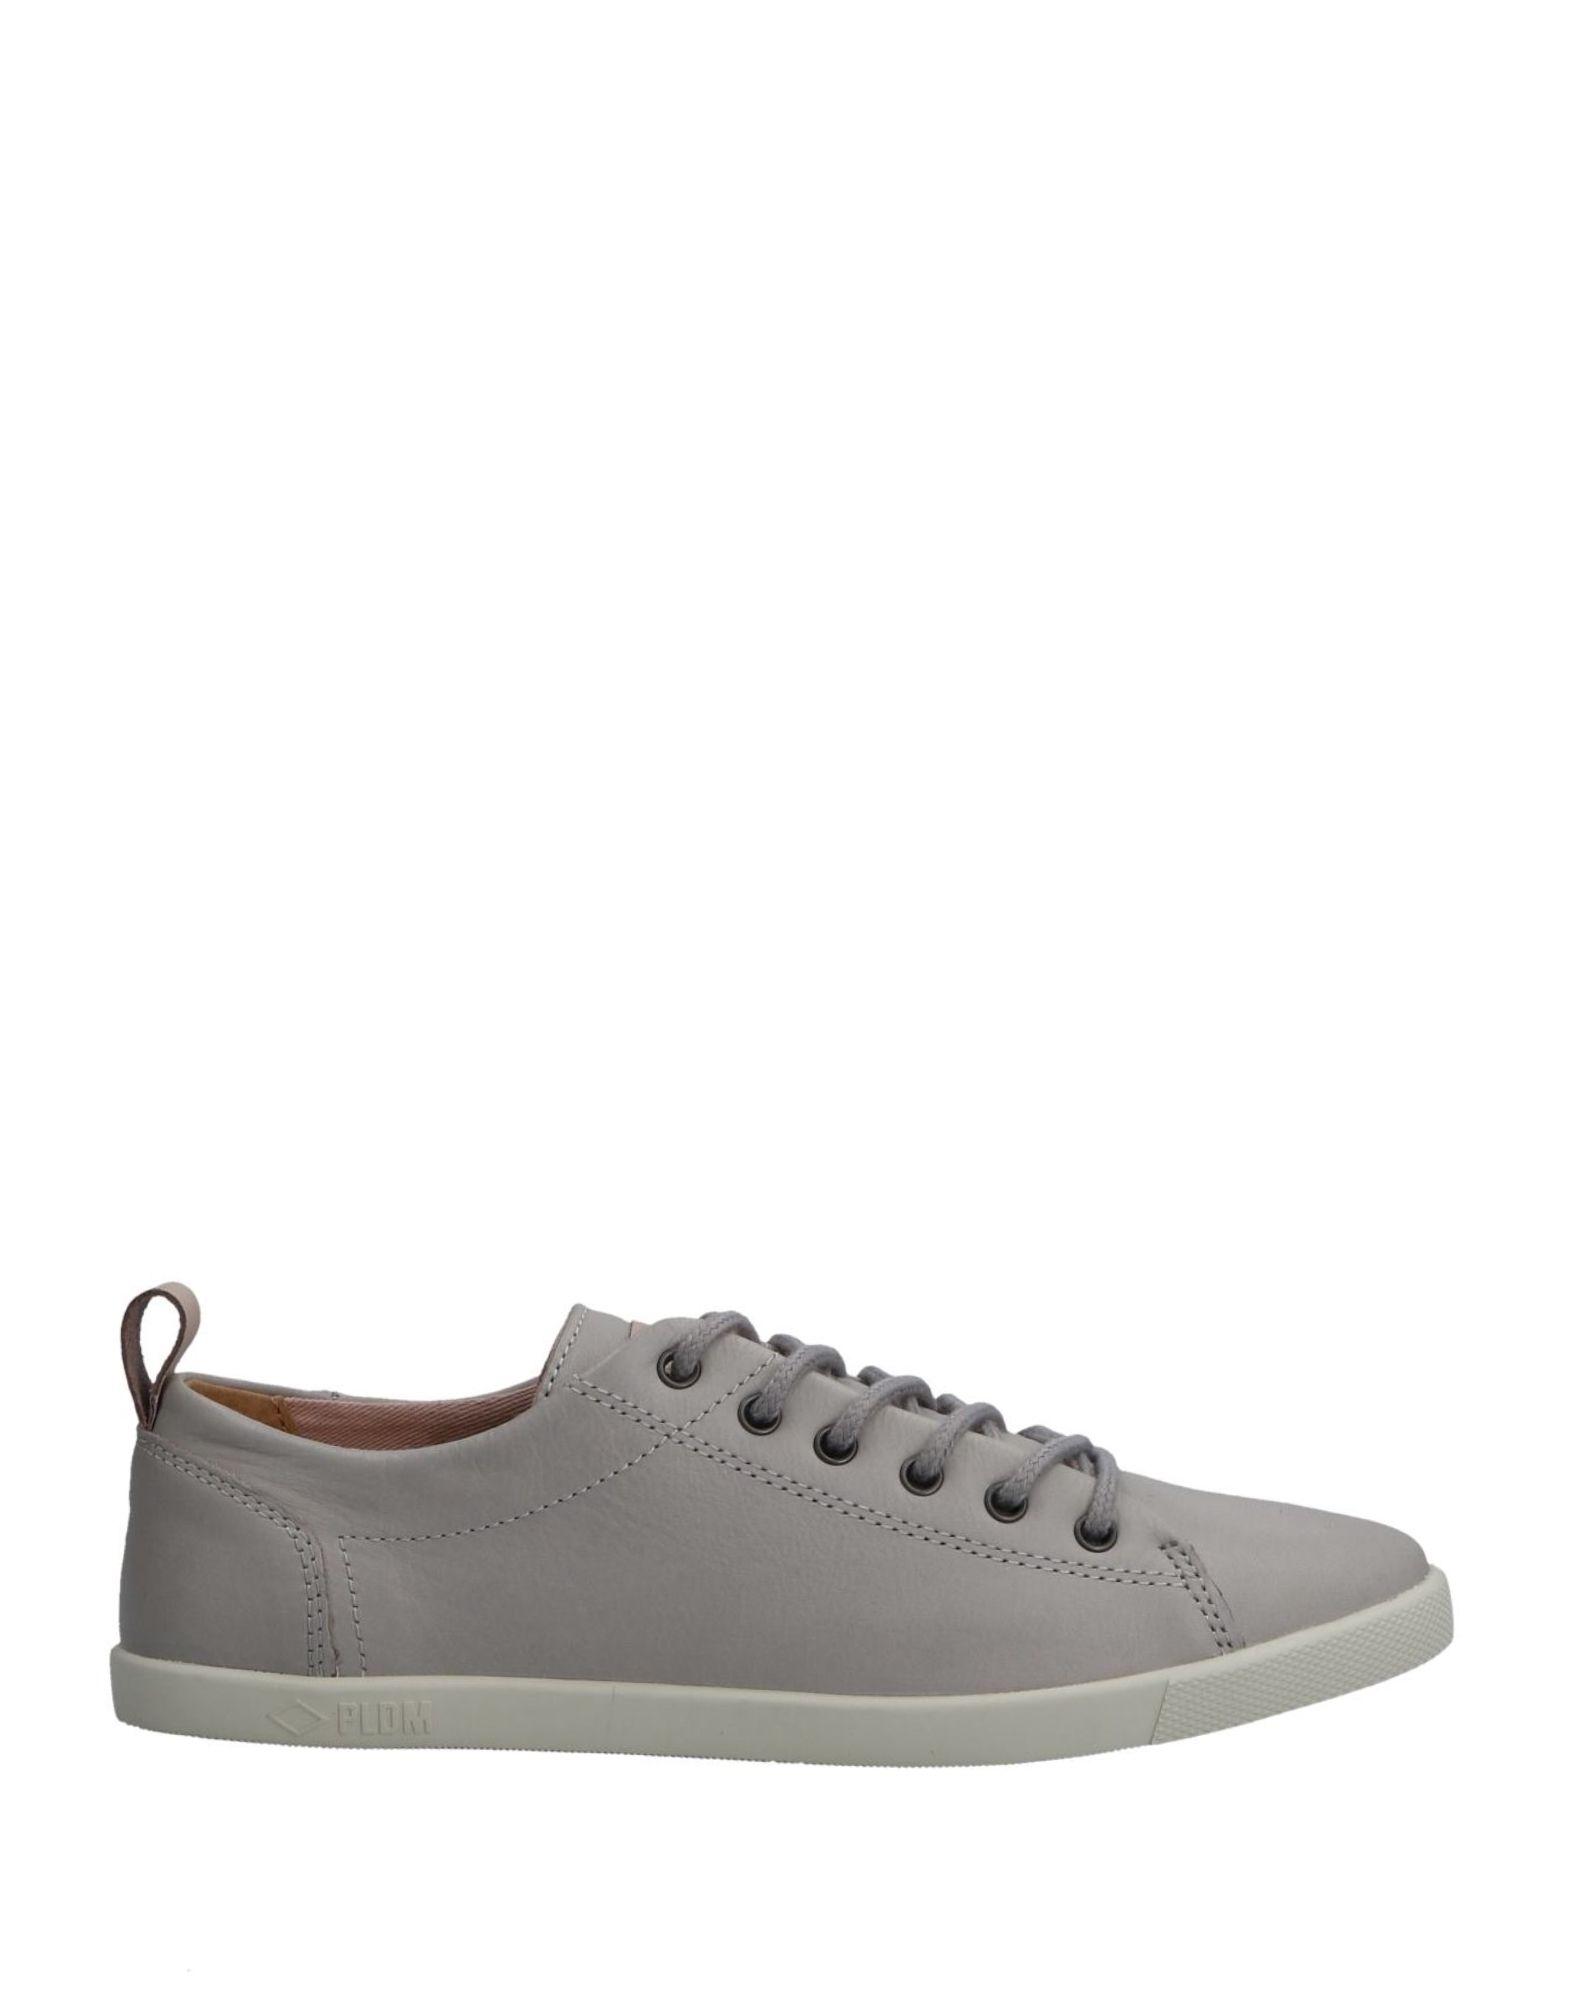 Sneakers Pldm By Palladium Donna 11528090TE - 11528090TE Donna 93e18a